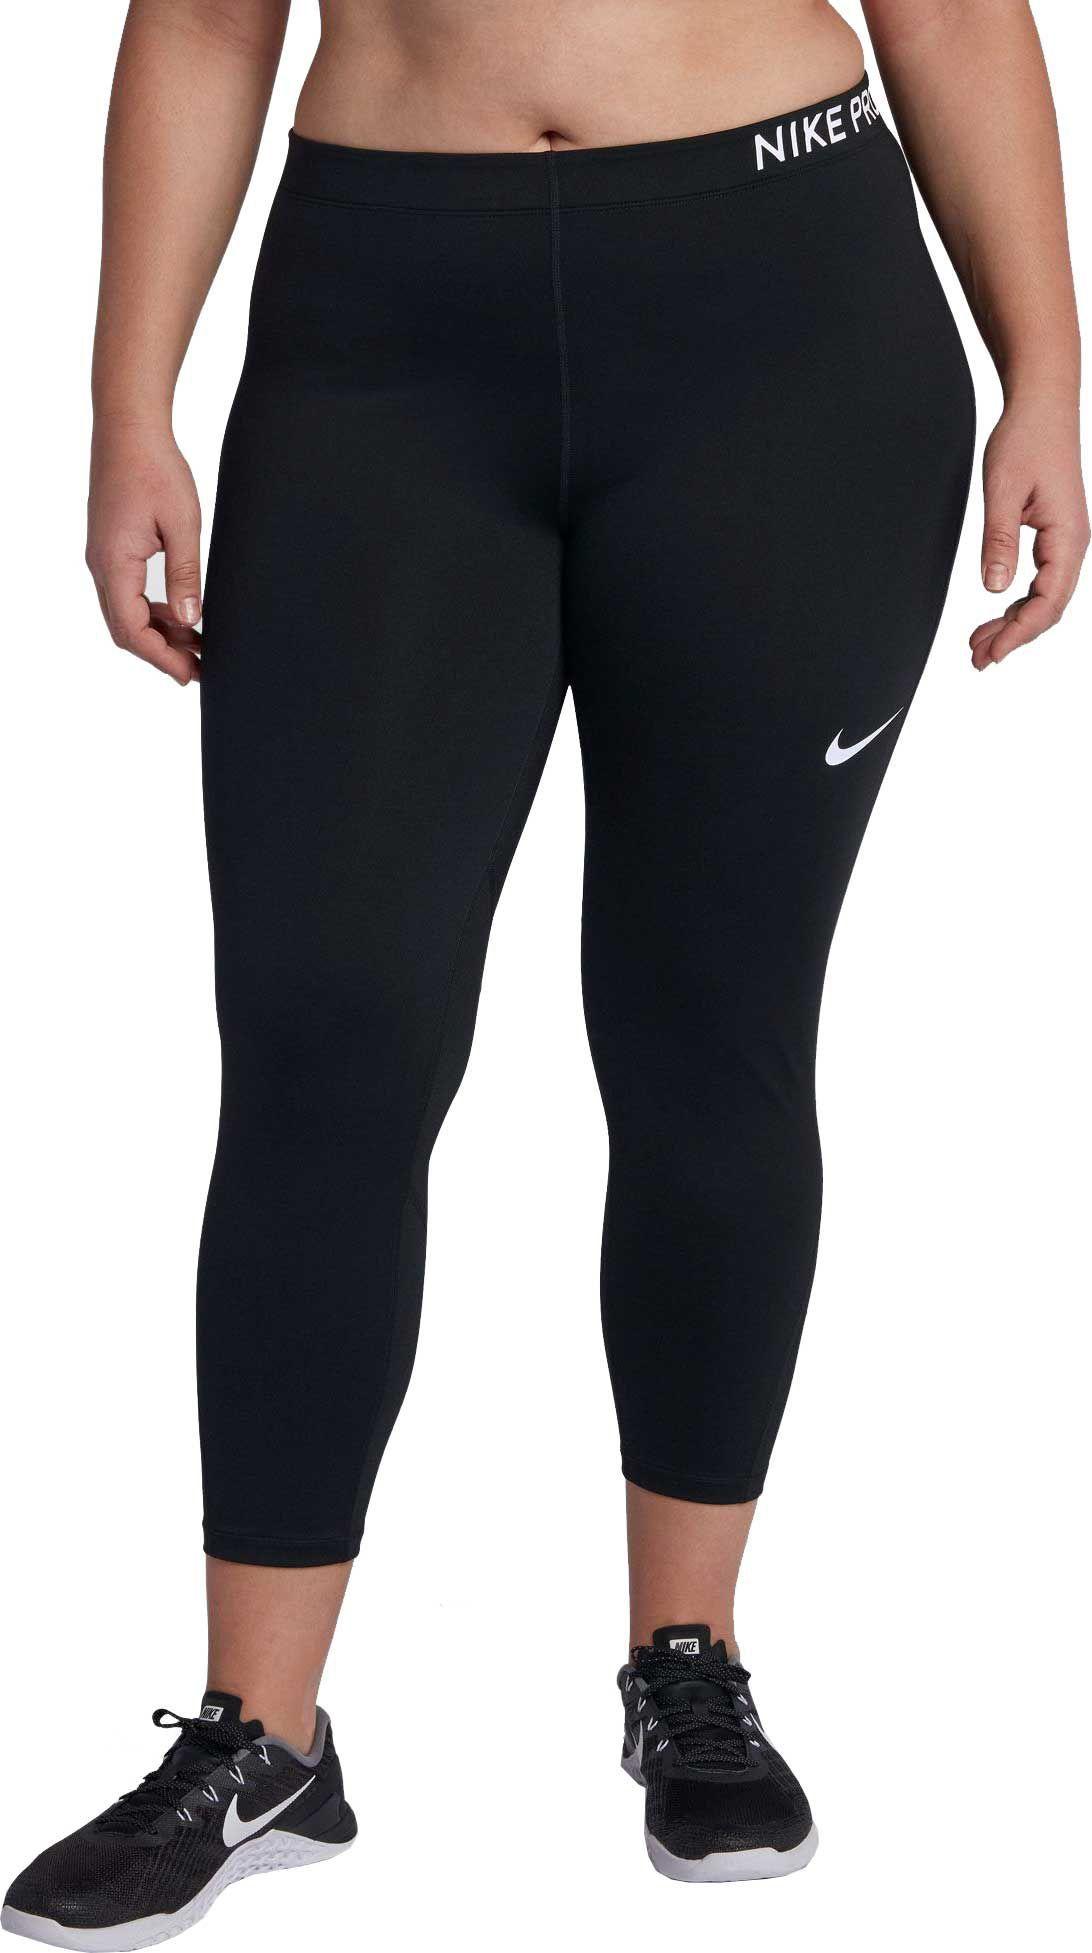 Nike Women S Plus Size Pro Training Capris Best Plus Size Clothing Plus Size Clothing Online Athletic Outfits